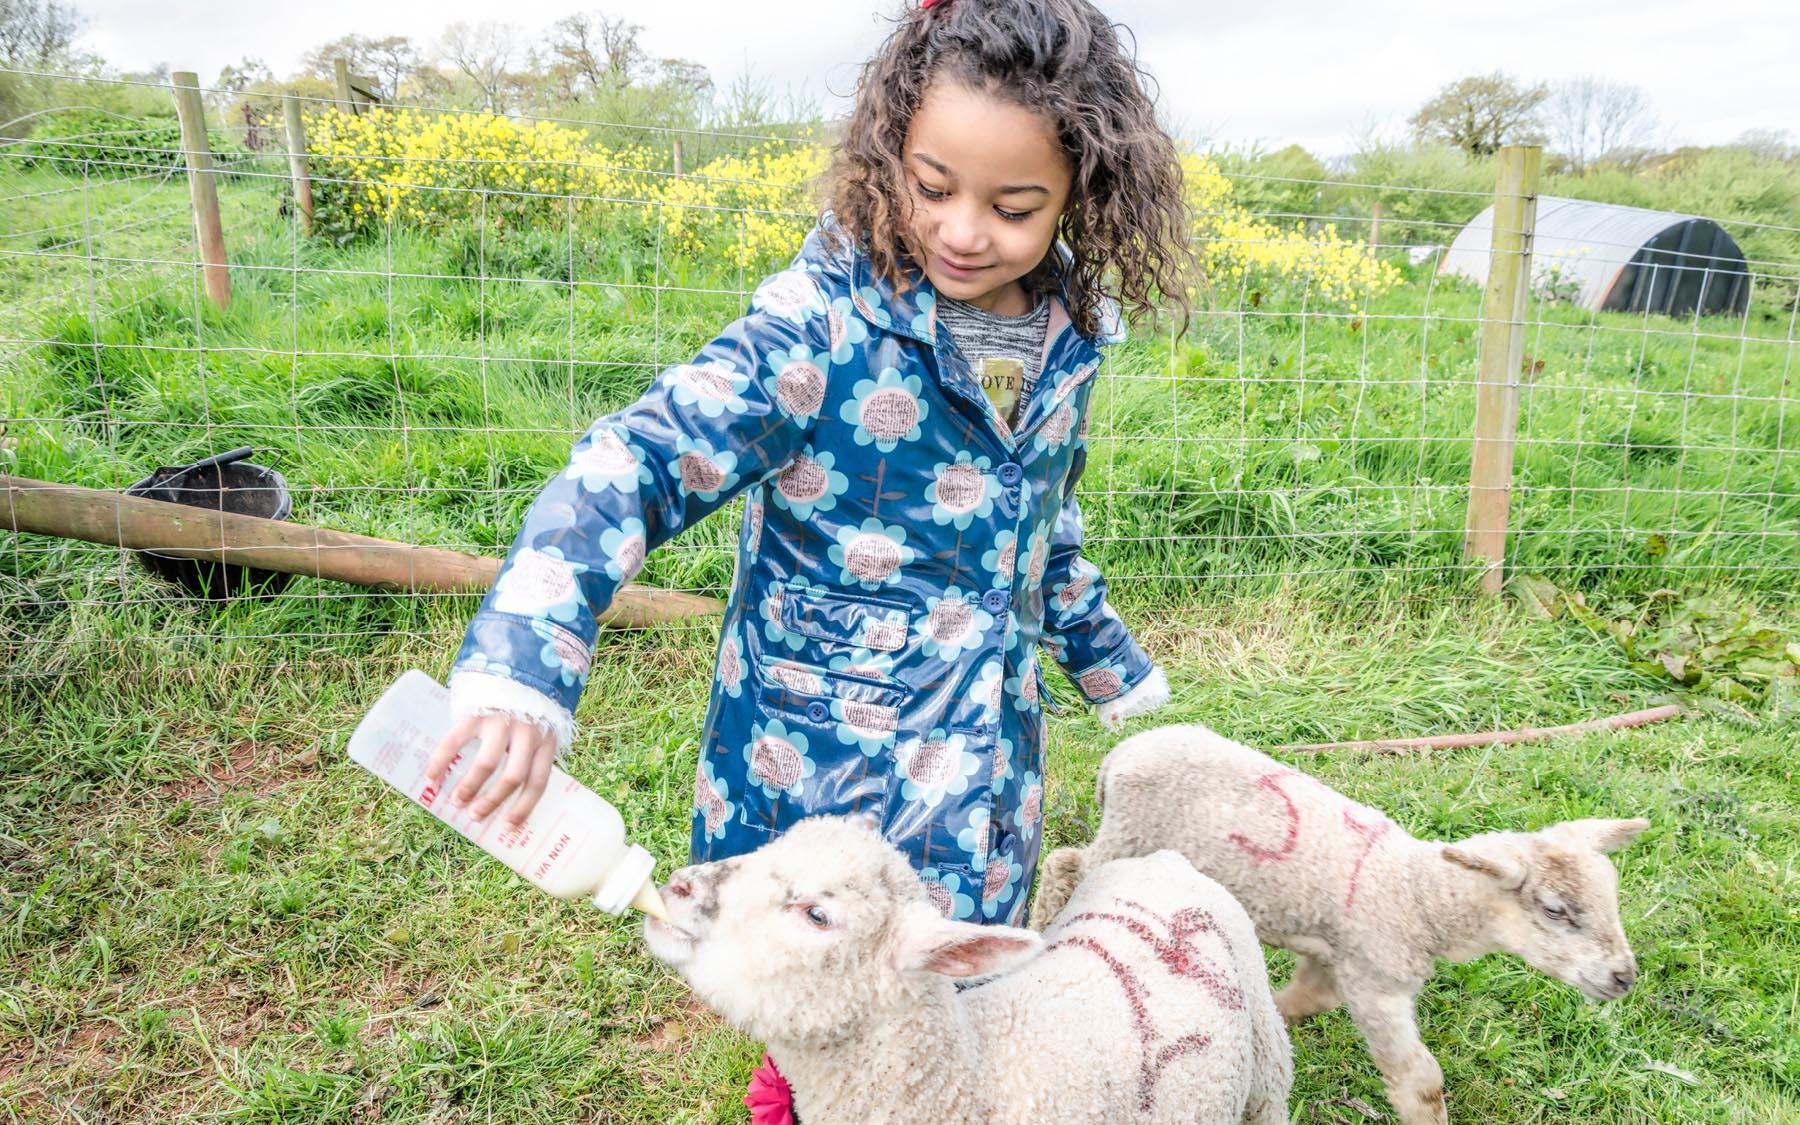 Animal interactions at Occombe Farm